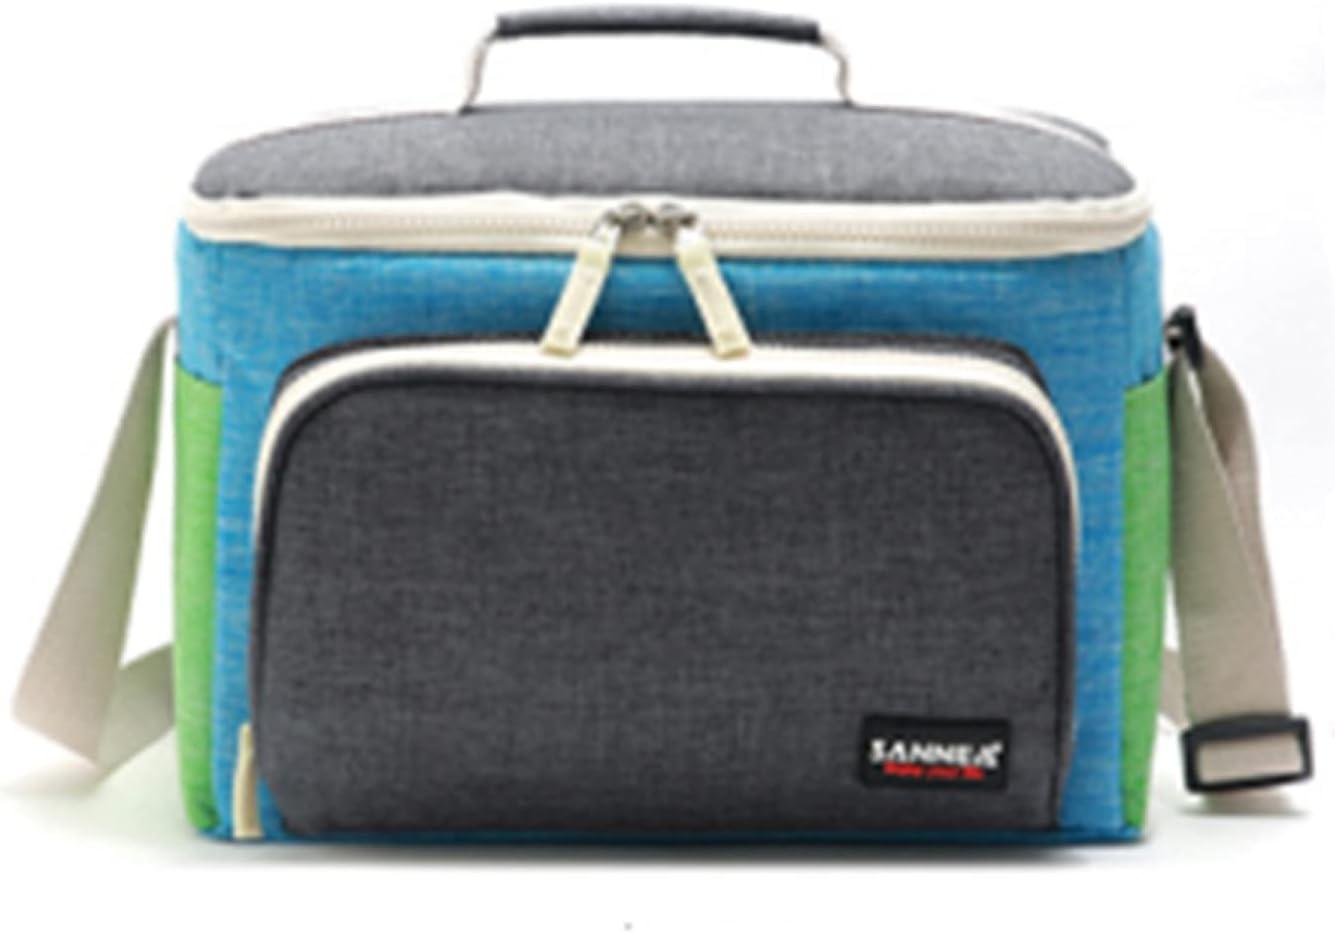 HSRWARE Picnic Bag Insulation Lunch Animer and price revision Portable Box Max 60% OFF Insulatio